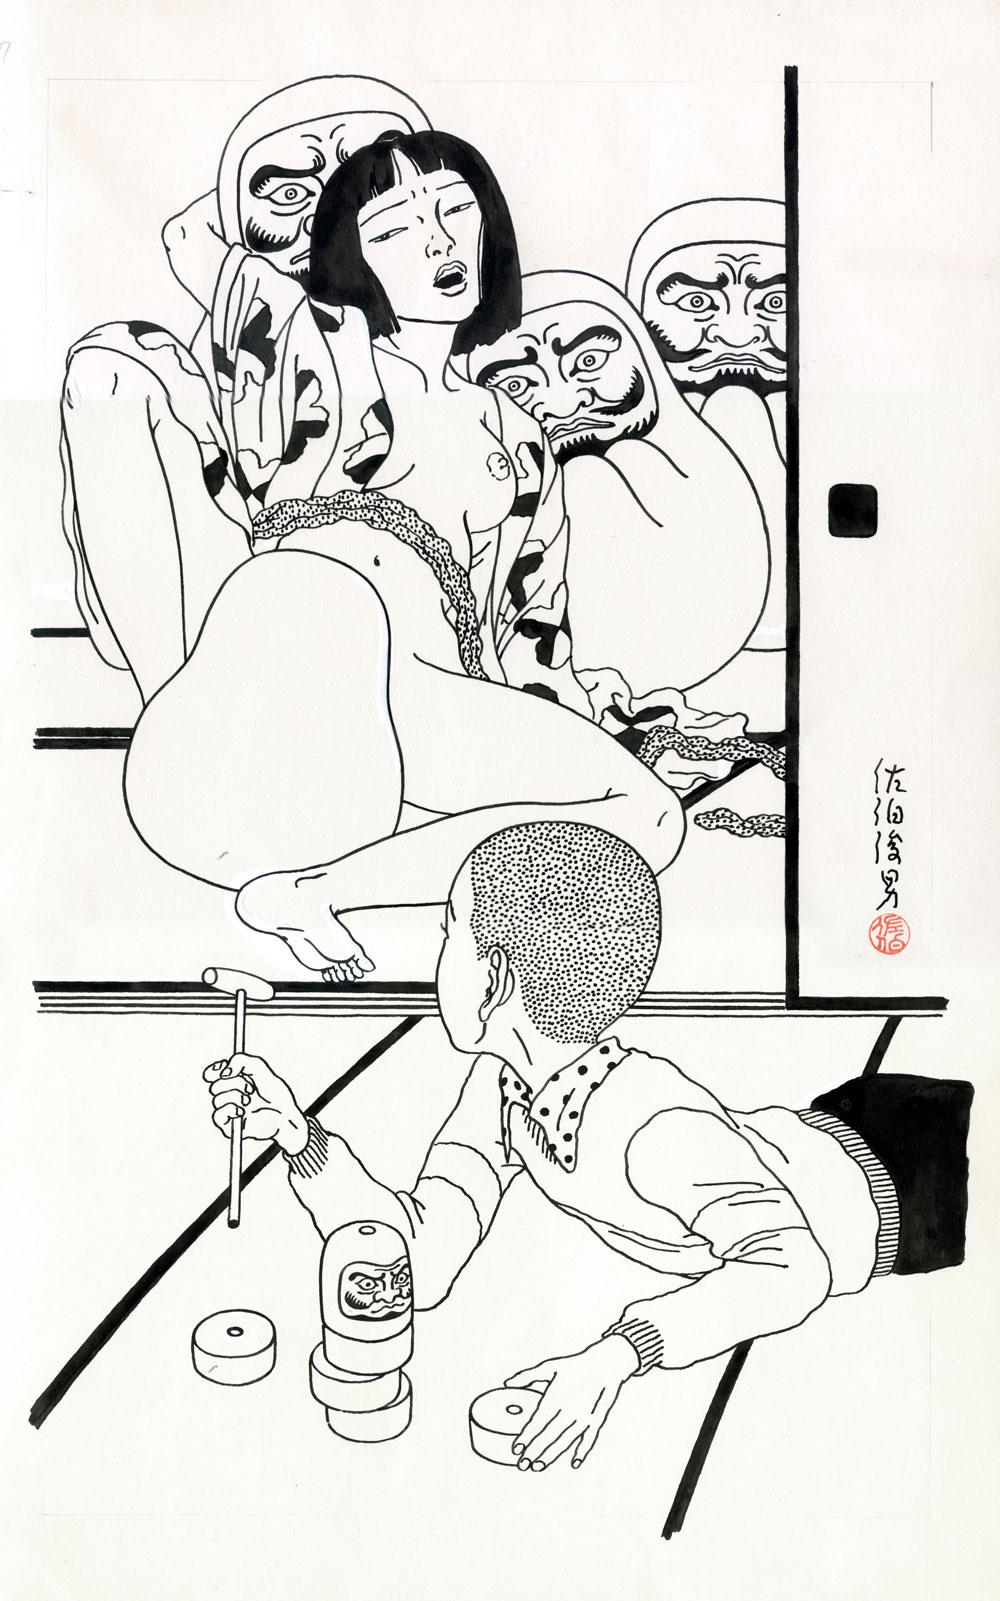 Toshio Saeki Irodaruma 11.75 x 18.25 in. Ink on paper, vellum. 1977